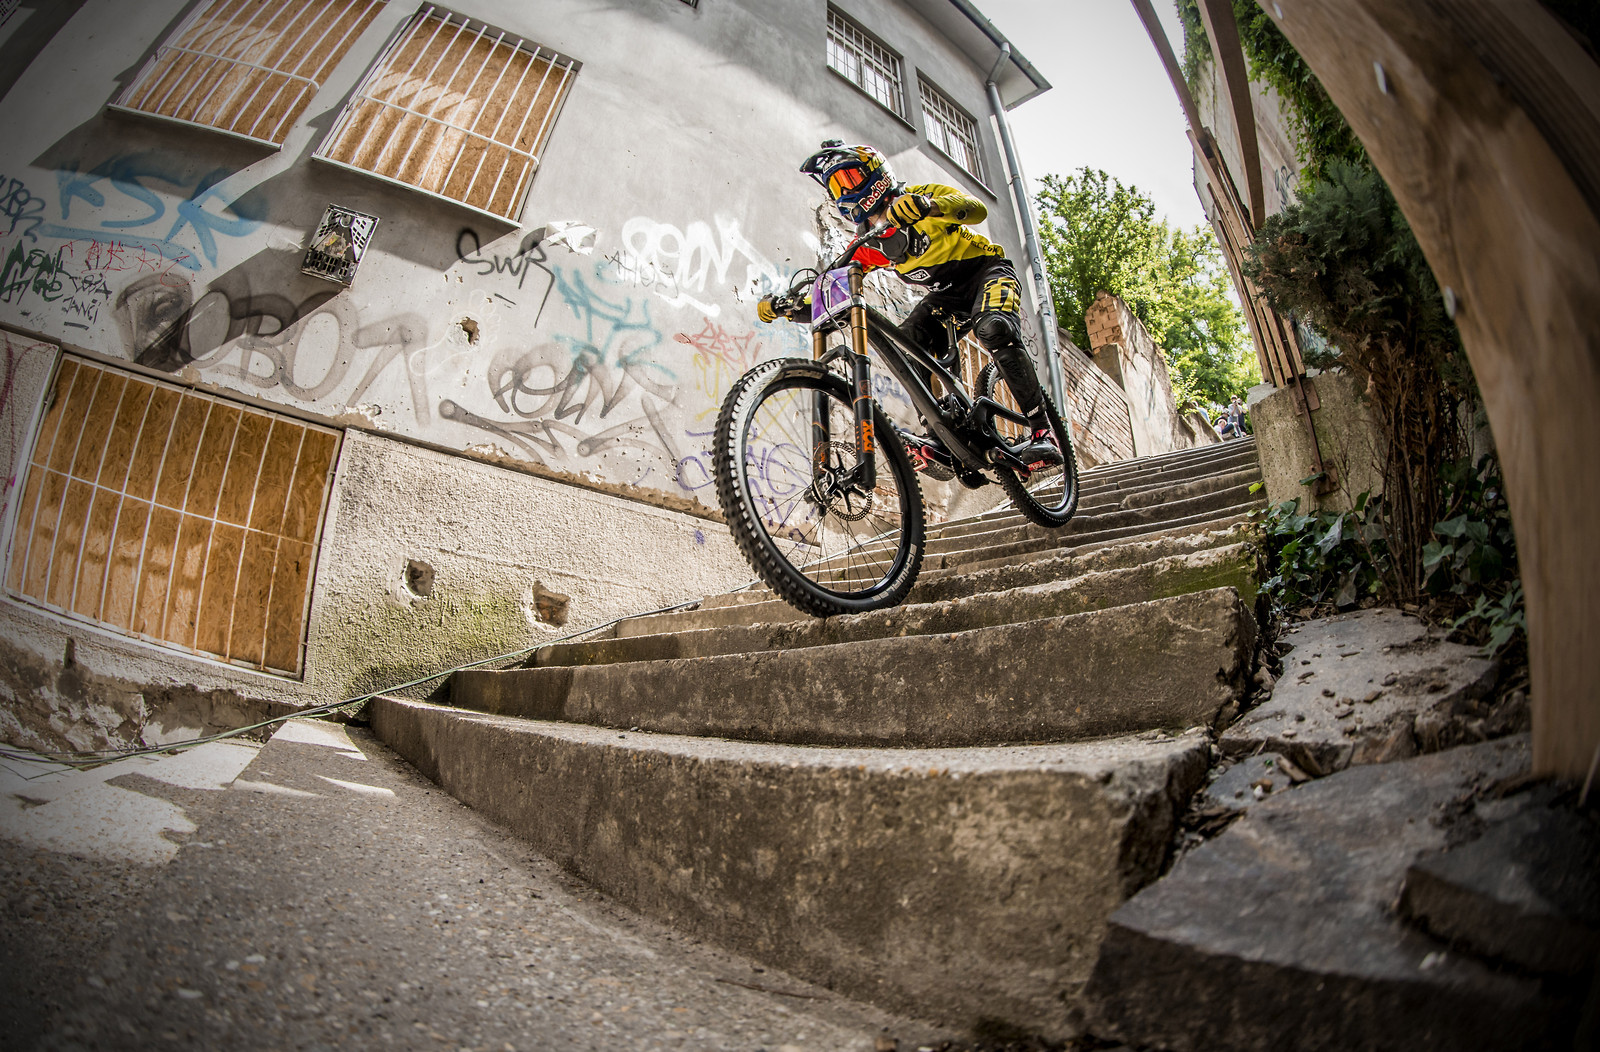 polecat city downhill slovenia - phunkt.com - Mountain Biking Pictures - Vital MTB